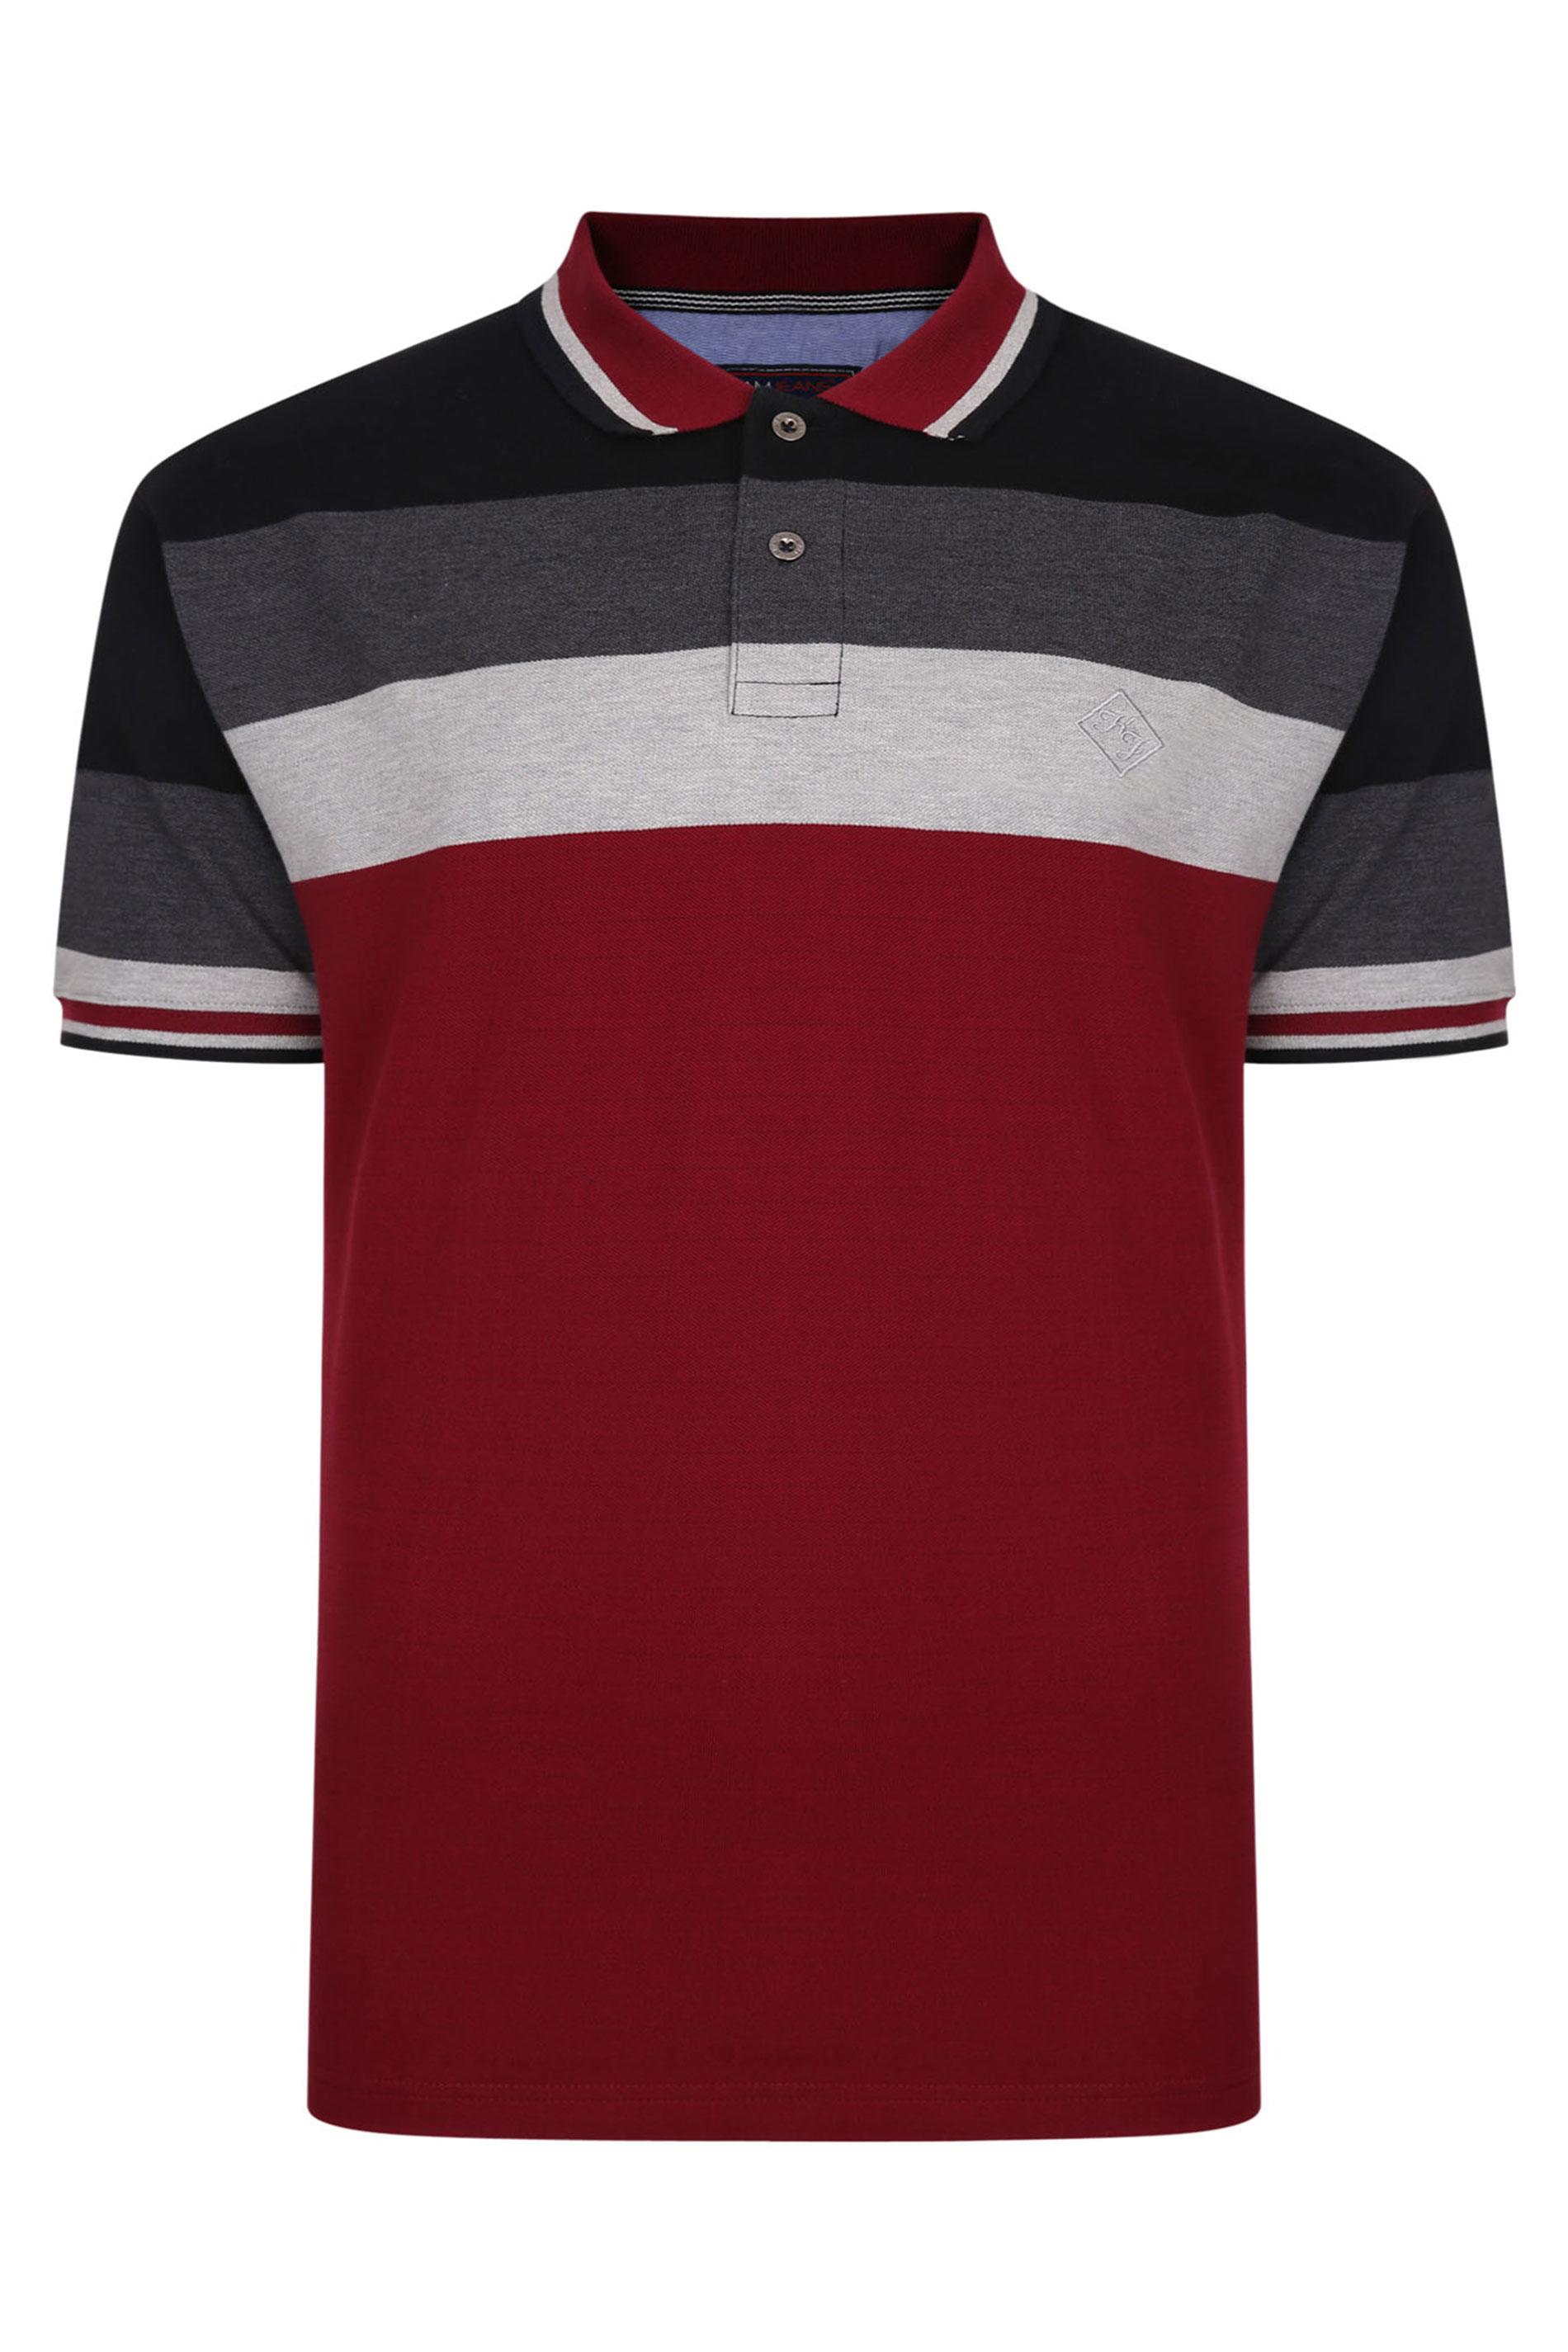 KAM Red Contrast Engineered Polo Shirt_F.jpg